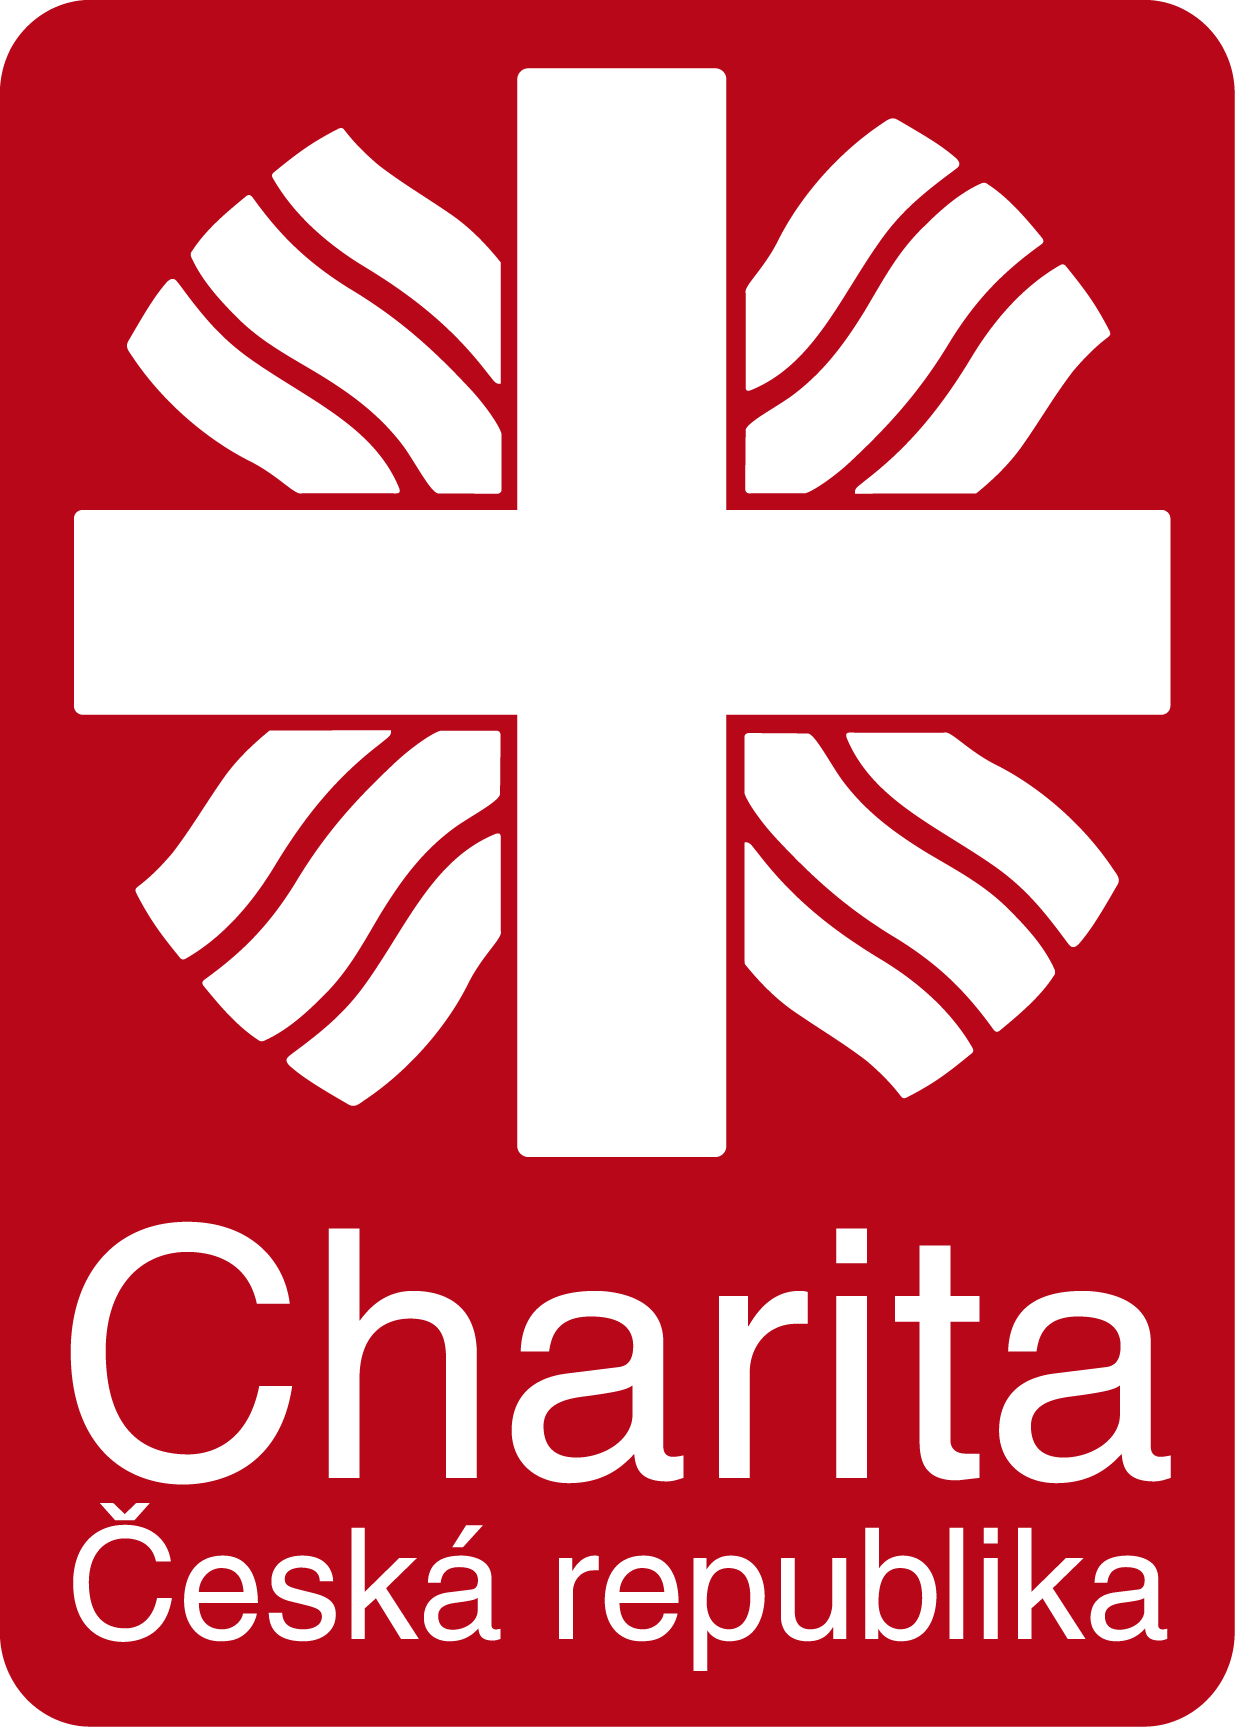 02log1_charita_1b